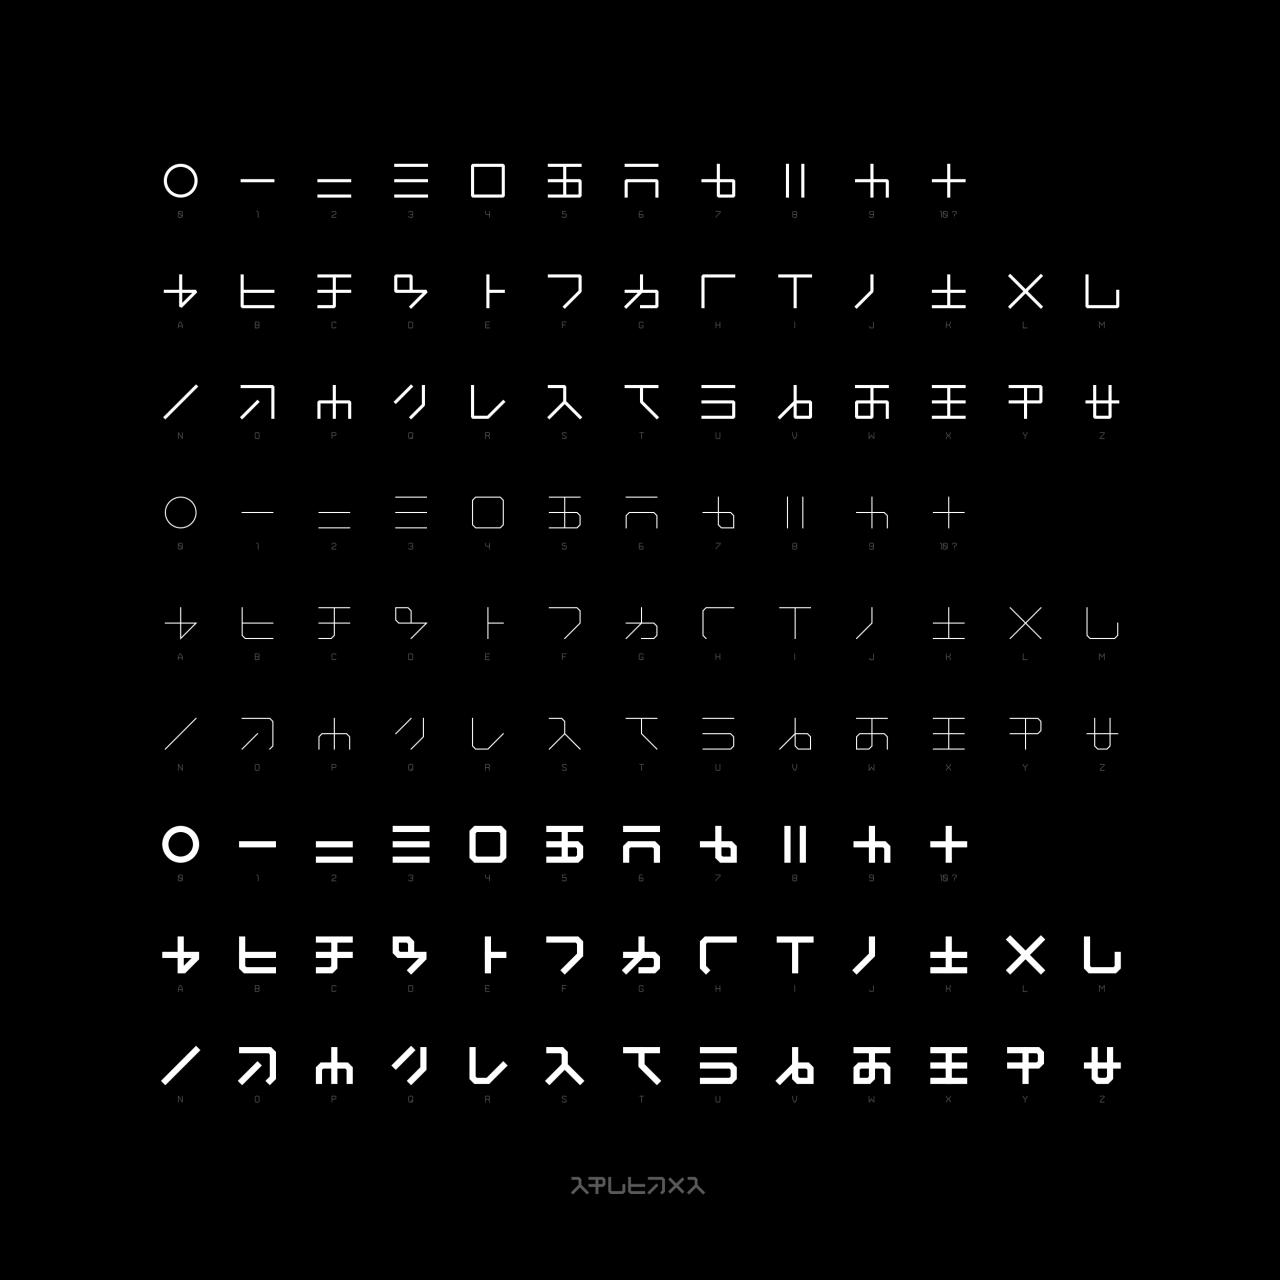 Symbol library i whipped up inspired by the beauty and simplicity symbol library i whipped up inspired by the beauty and simplicity of hiragana and katakana biocorpaavc